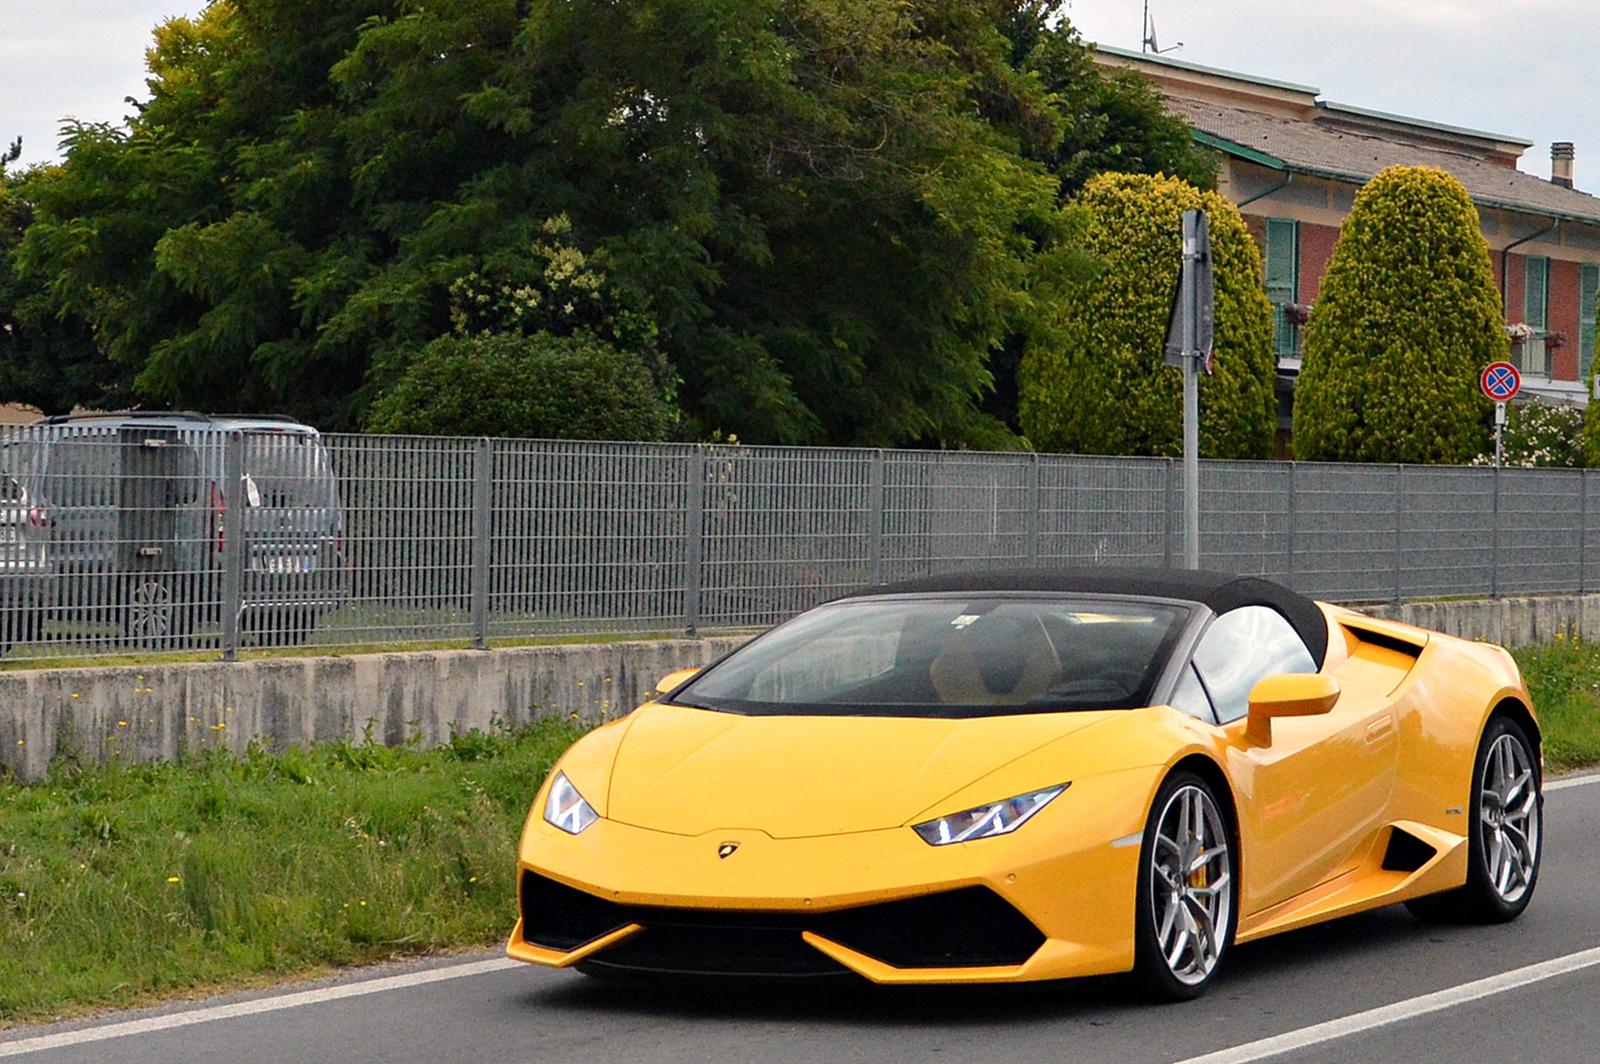 Lamborghini Huracán Spyder